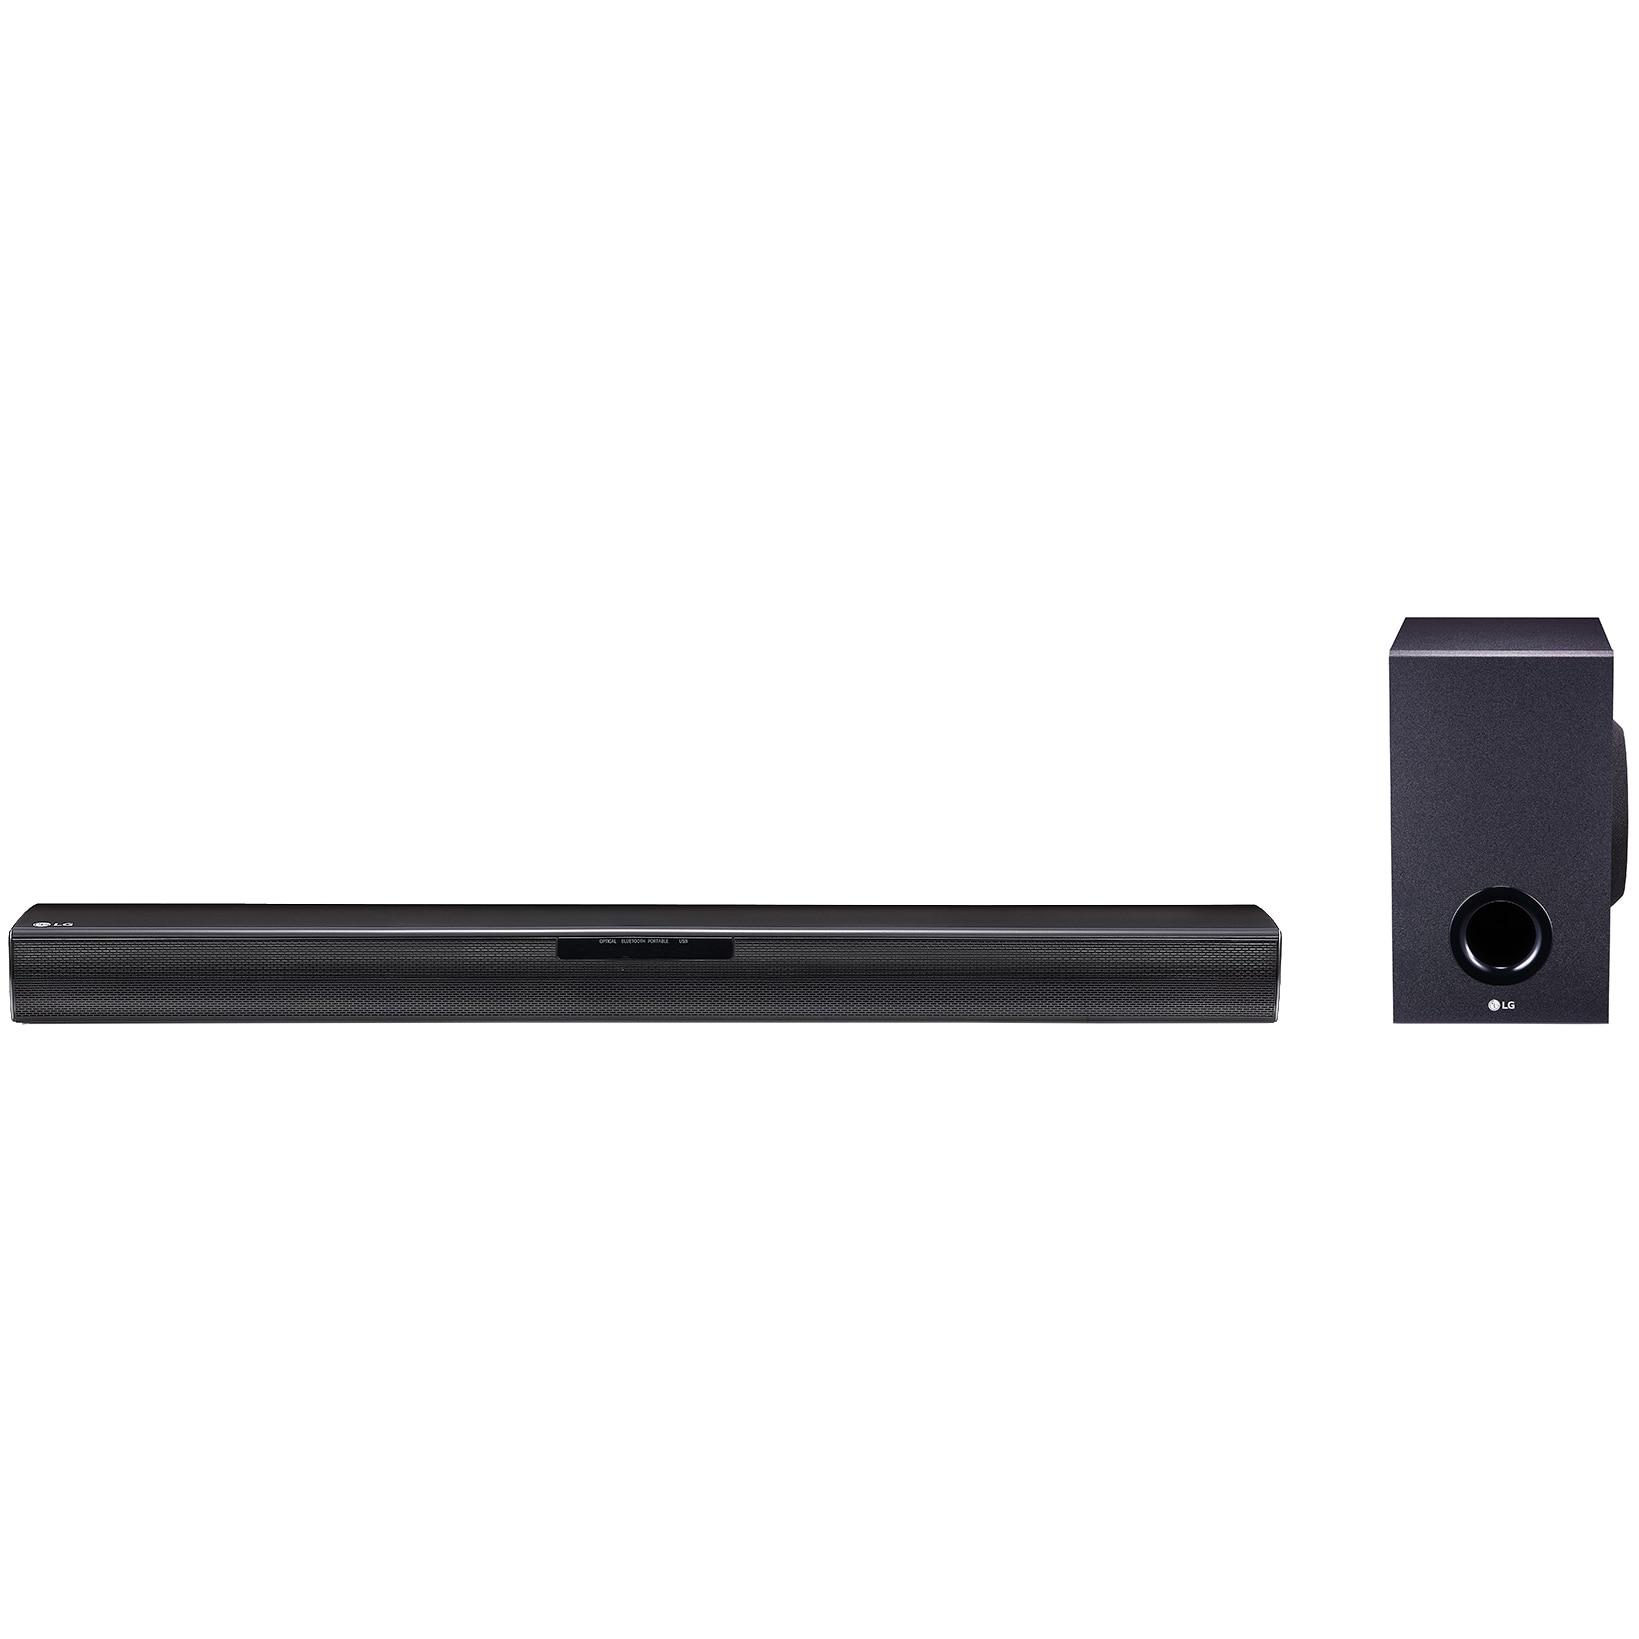 Fotografie Soundbar LG SJ2, 160W, 2.1, Bluetooth,Wireless Subwoofer, Negru